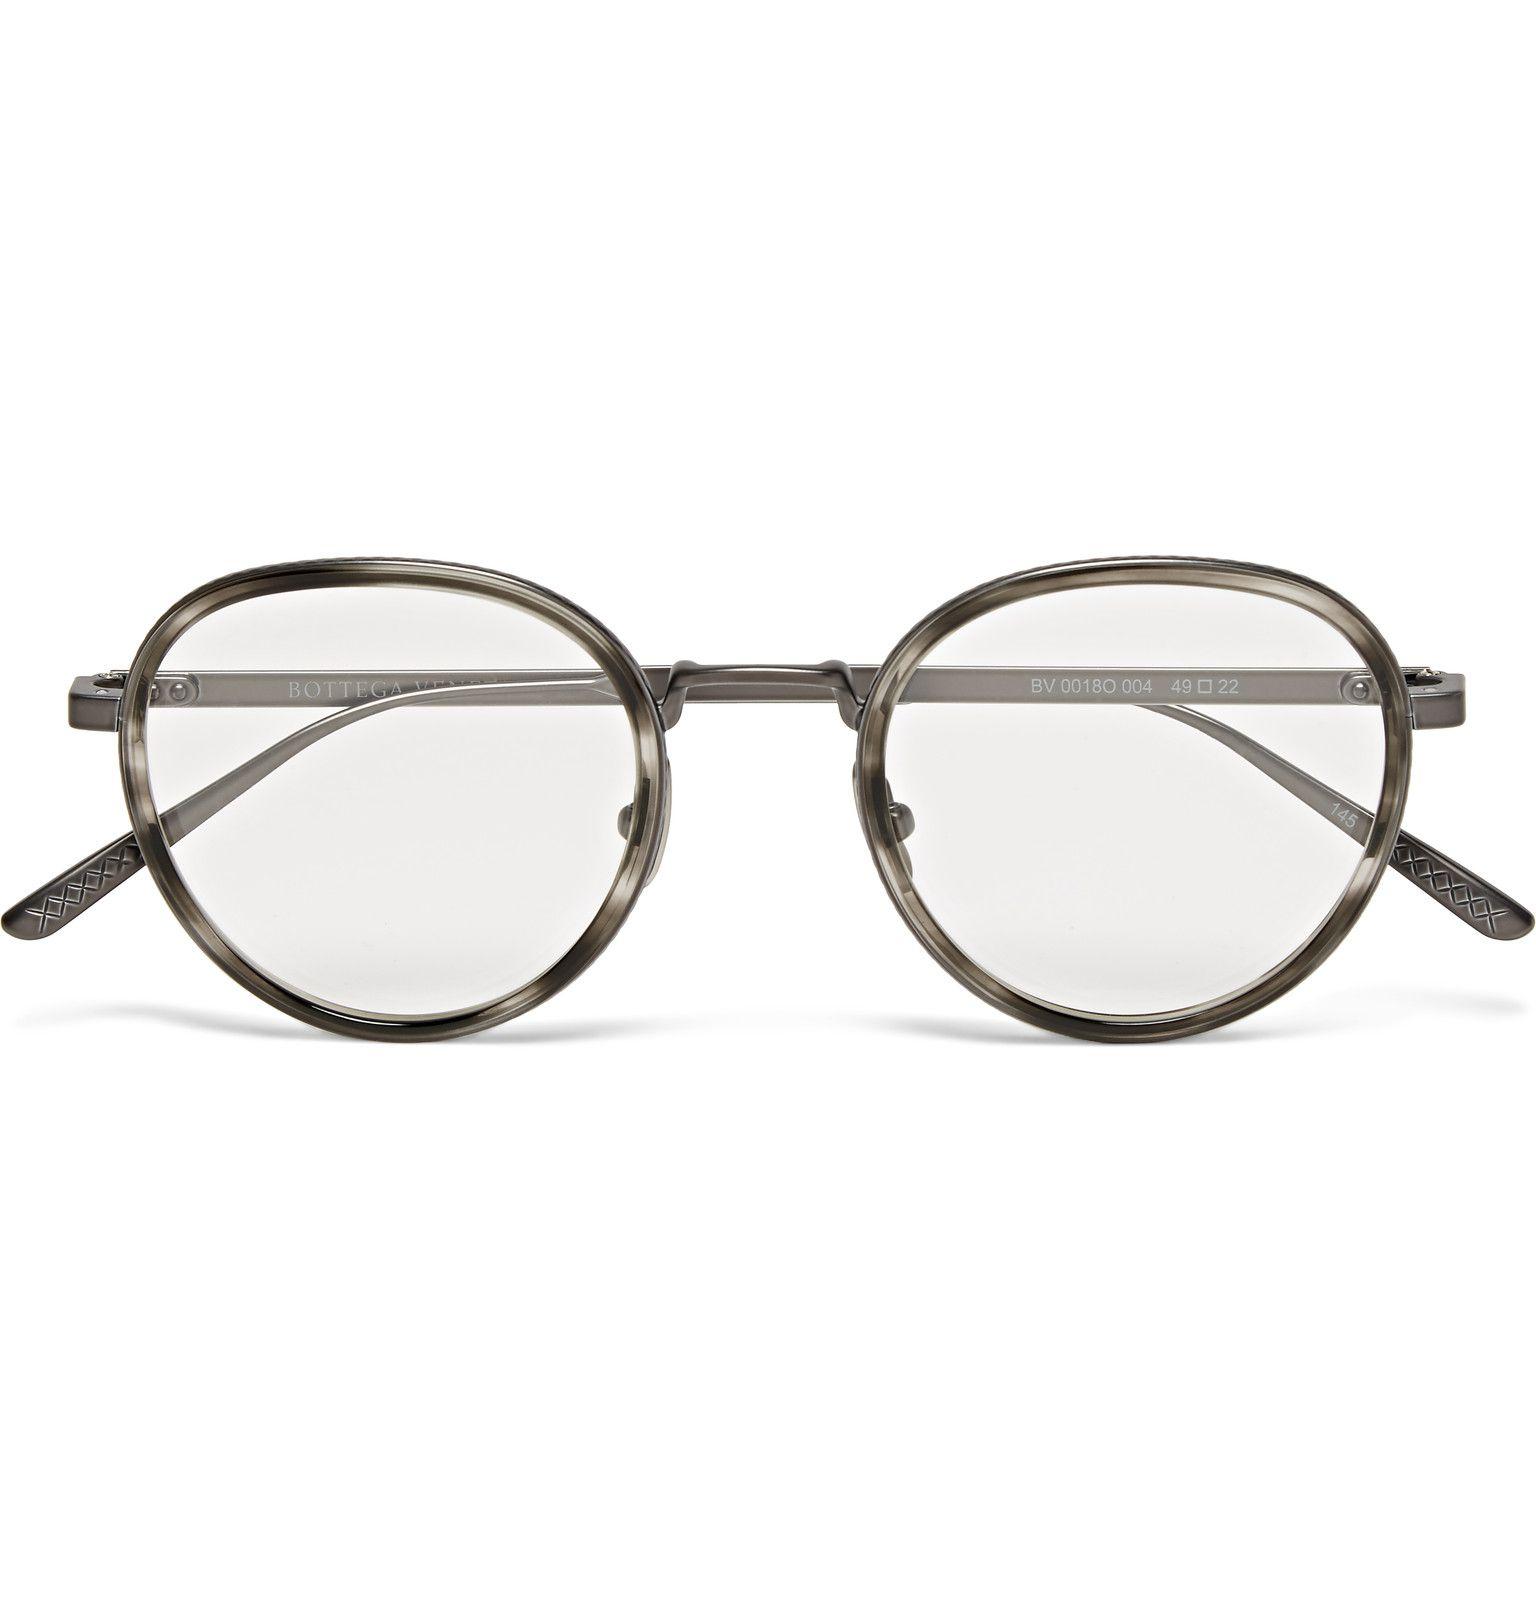 2996d5b46d Bottega Veneta - Round-Frame Acetate and Titanium Optical Glasses ...